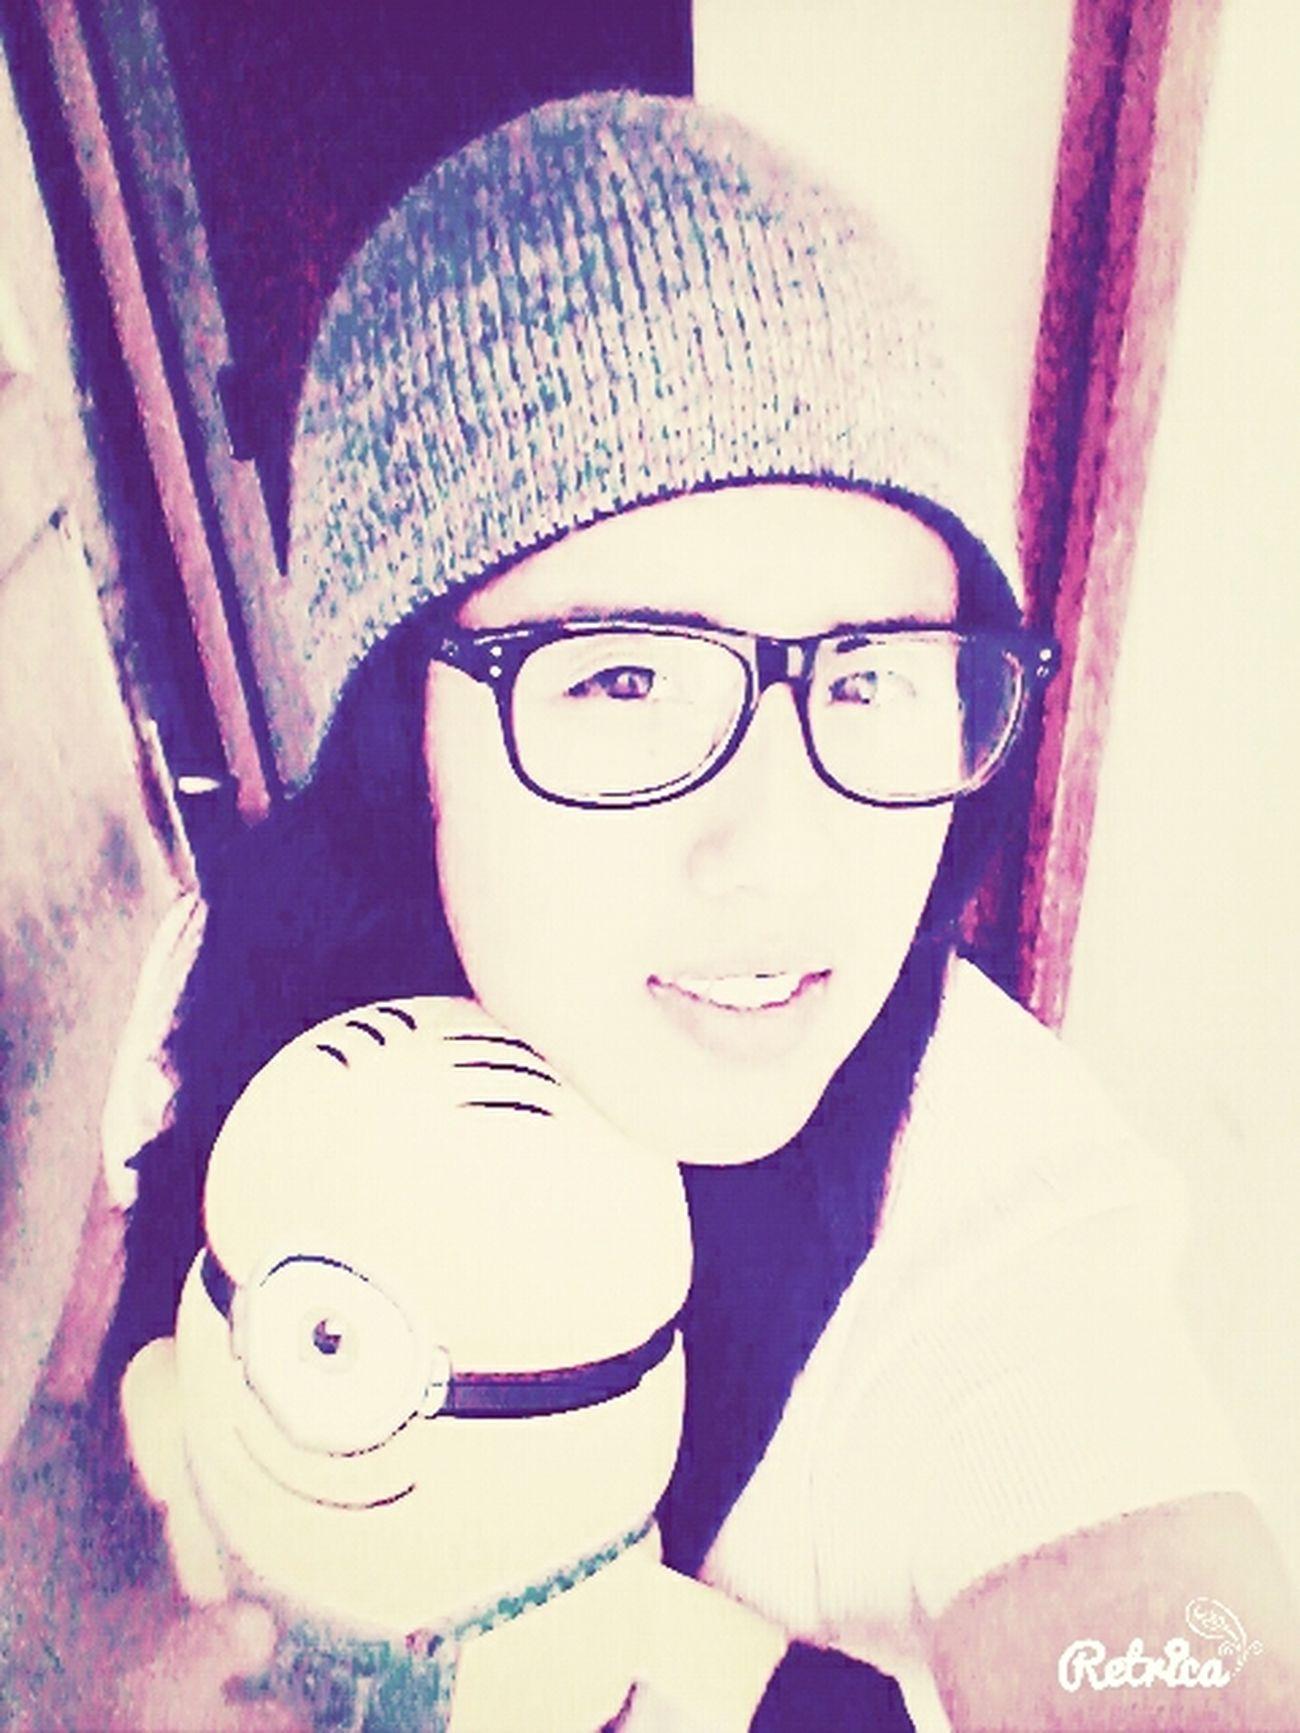 Minions ♥♥ Happy :) Muecas Raras!